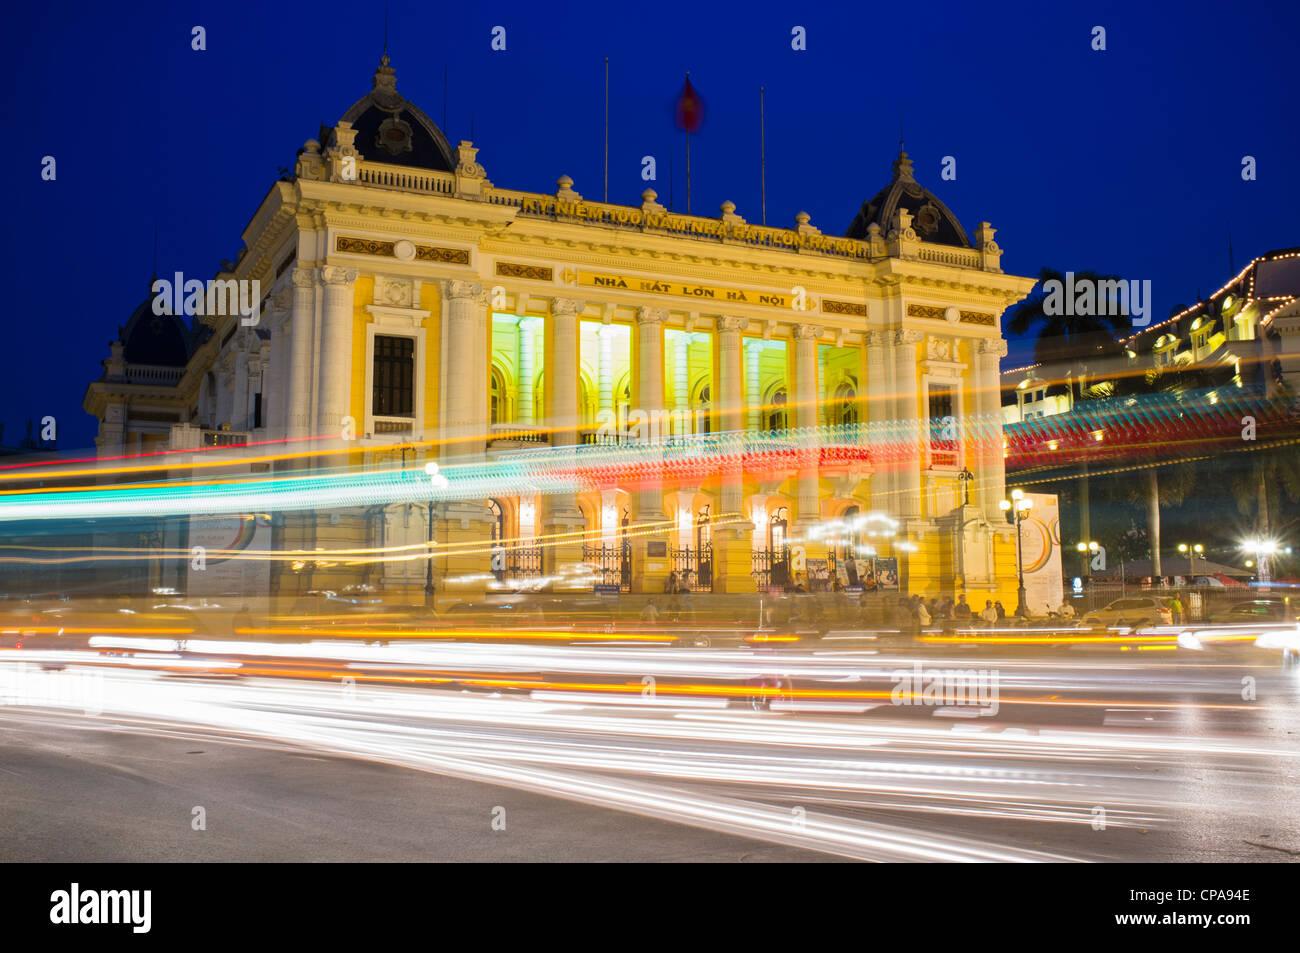 Night view of Hanoi Opera House with traffic Vietnam - Stock Image